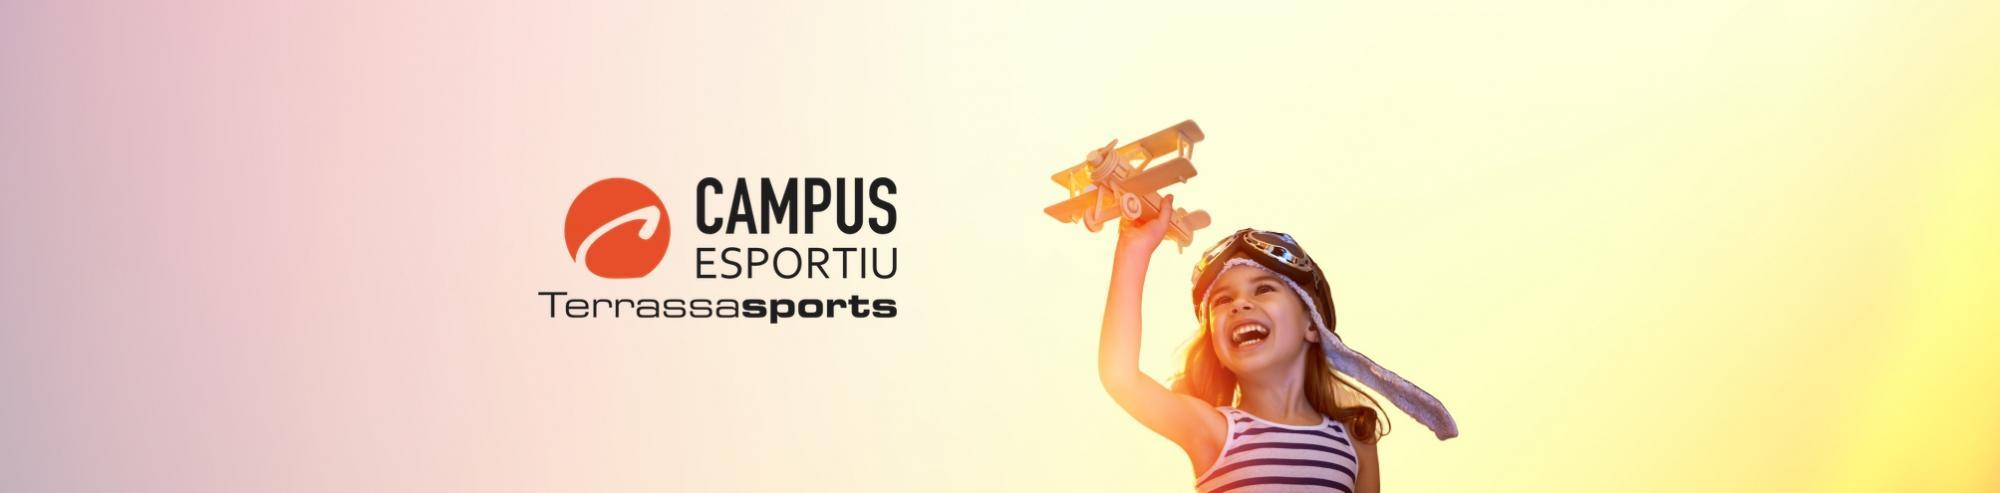 seccio/informacio-general/inscripcions-obertes-pel-campus-estiu-19